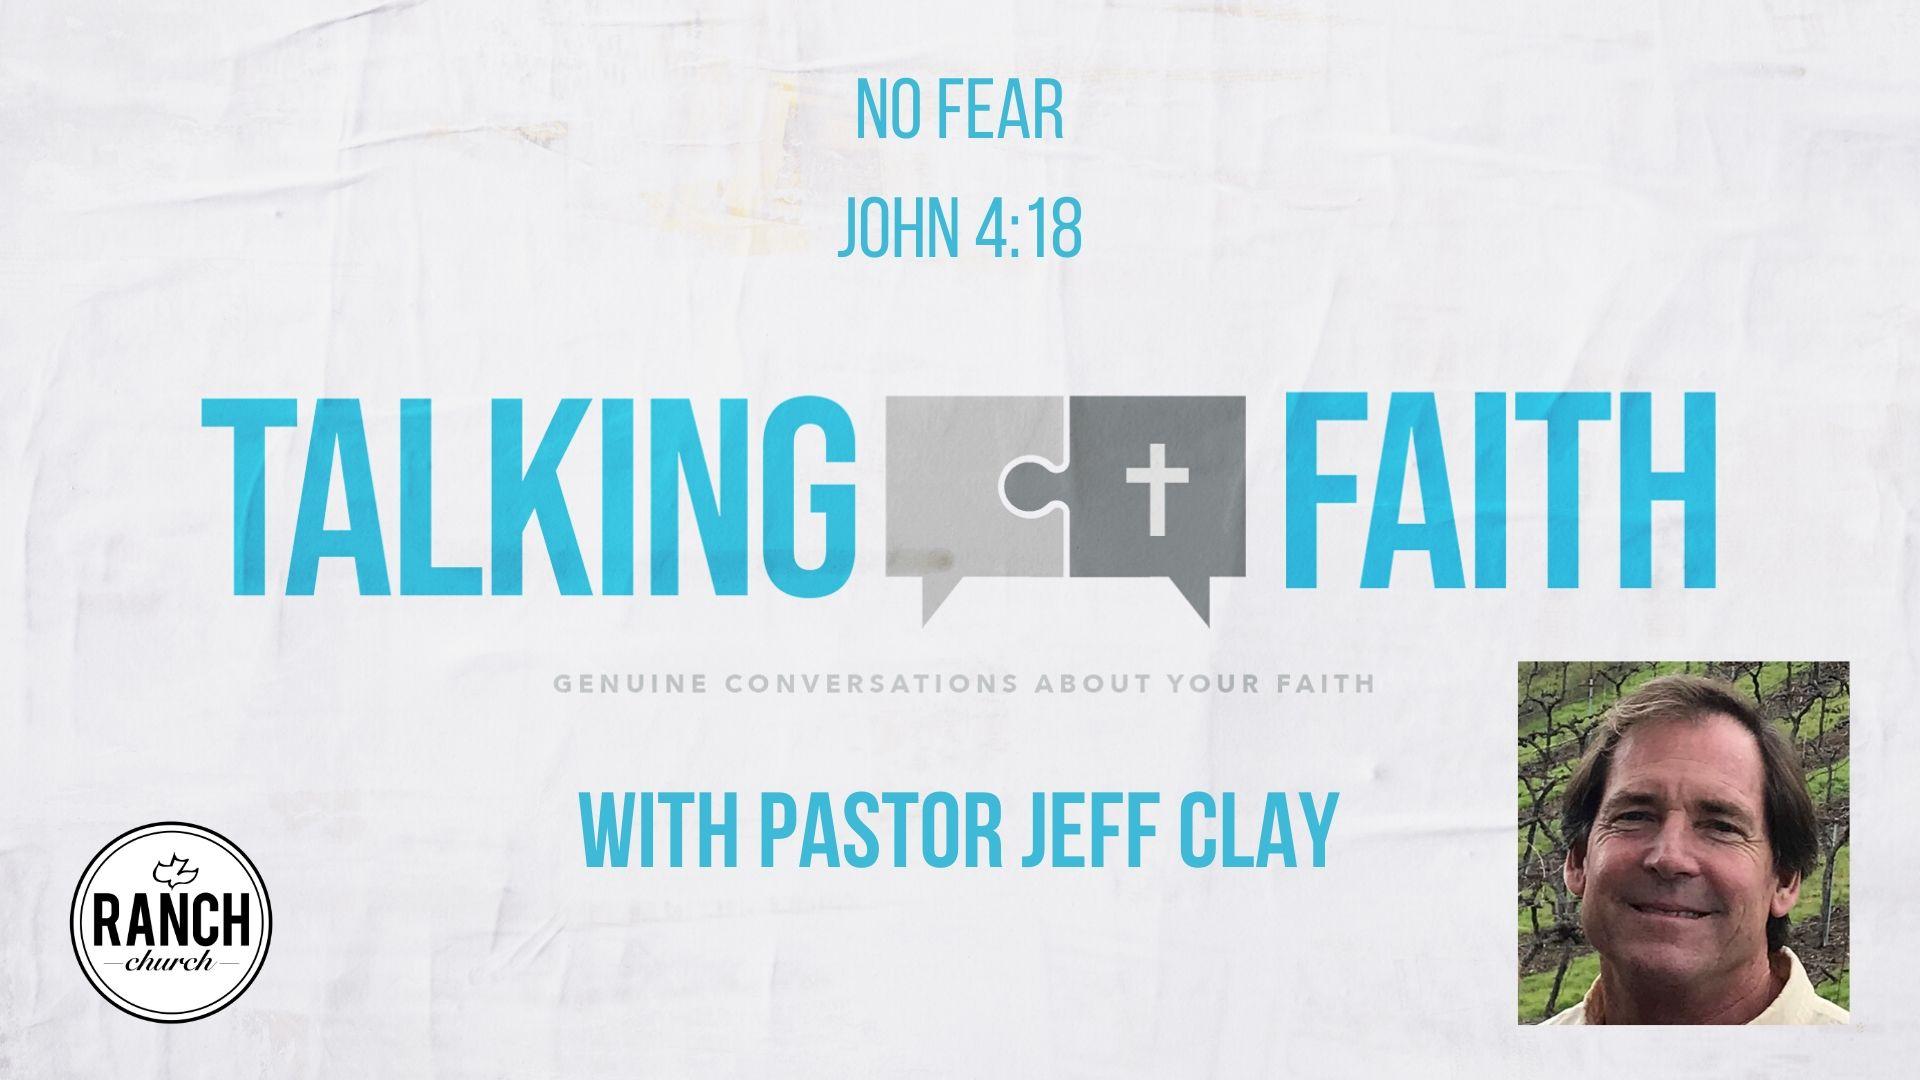 TALKING FAITH 6-3-2020